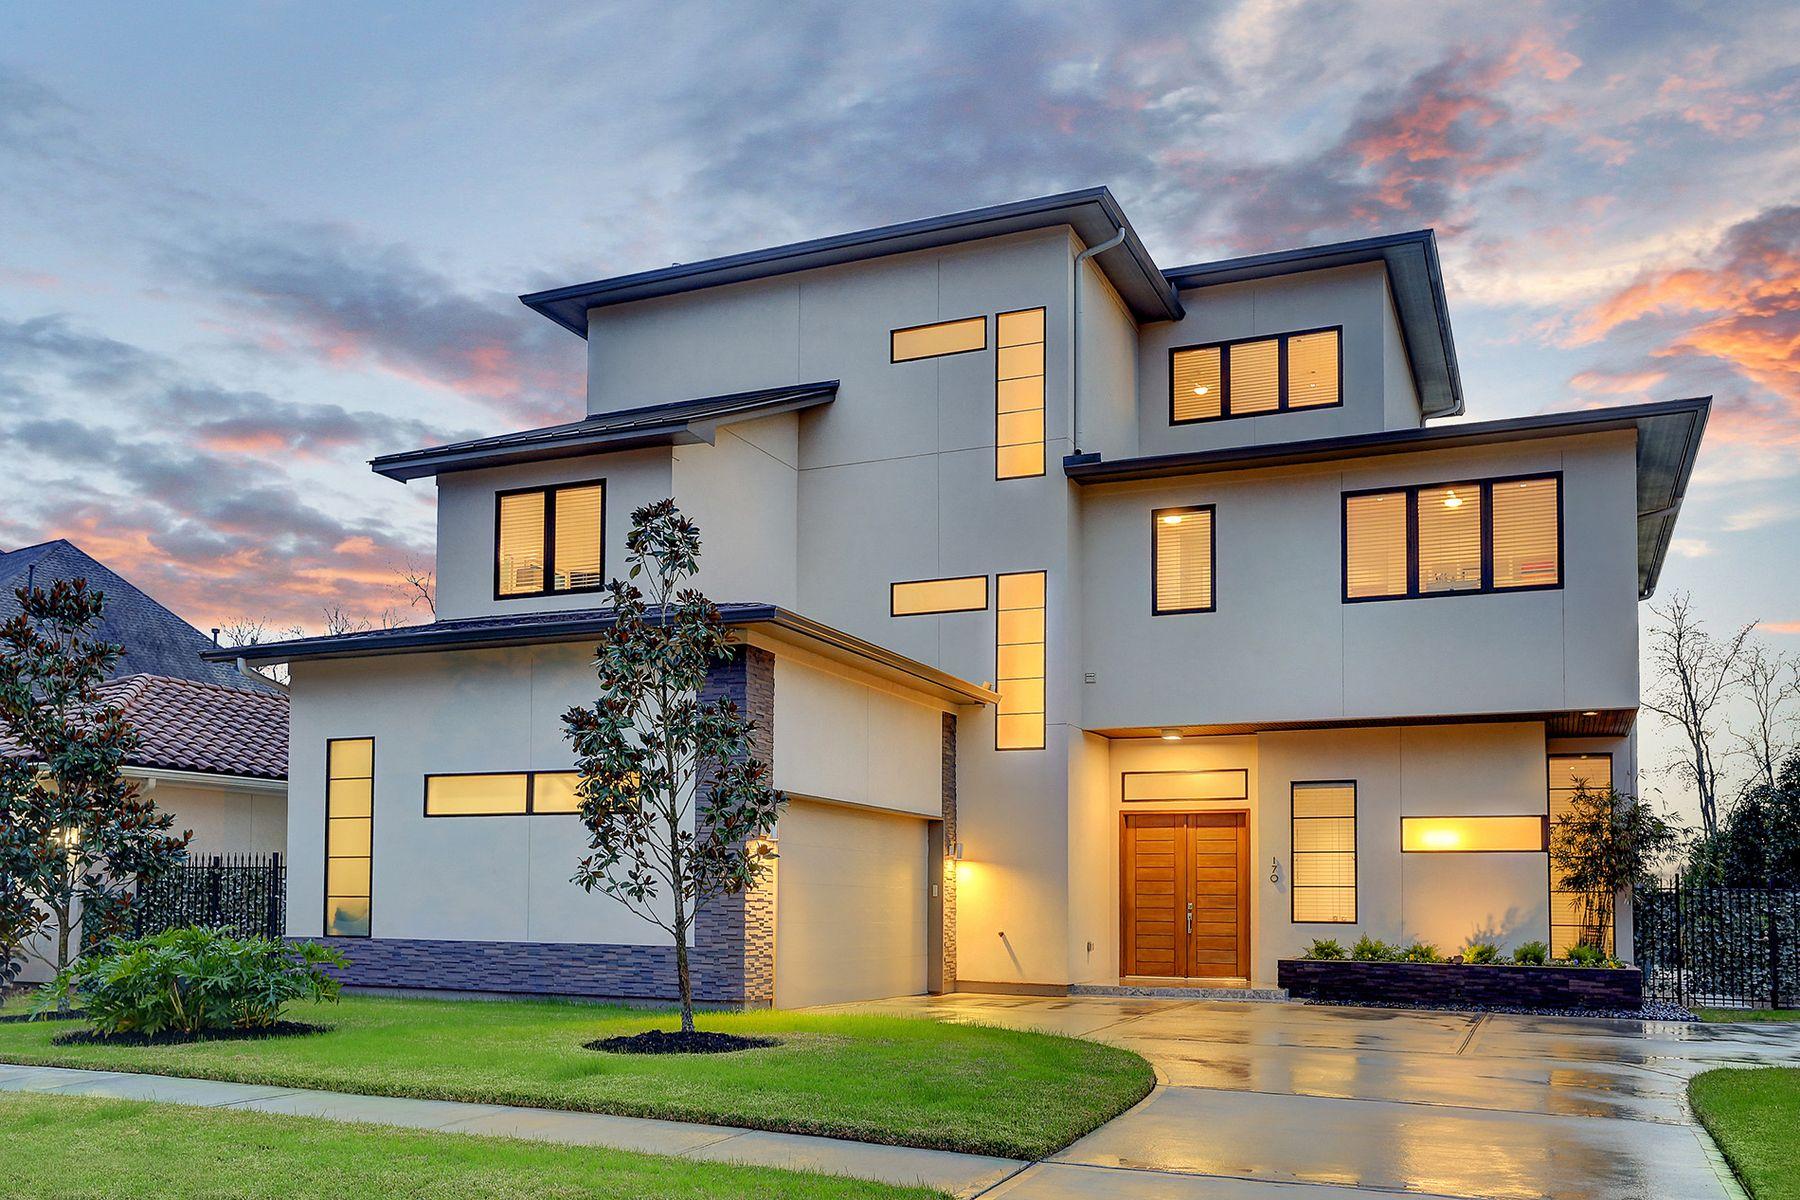 Single Family Homes for Sale at 170 Flamingo Island Drive Missouri City, Texas 77459 United States